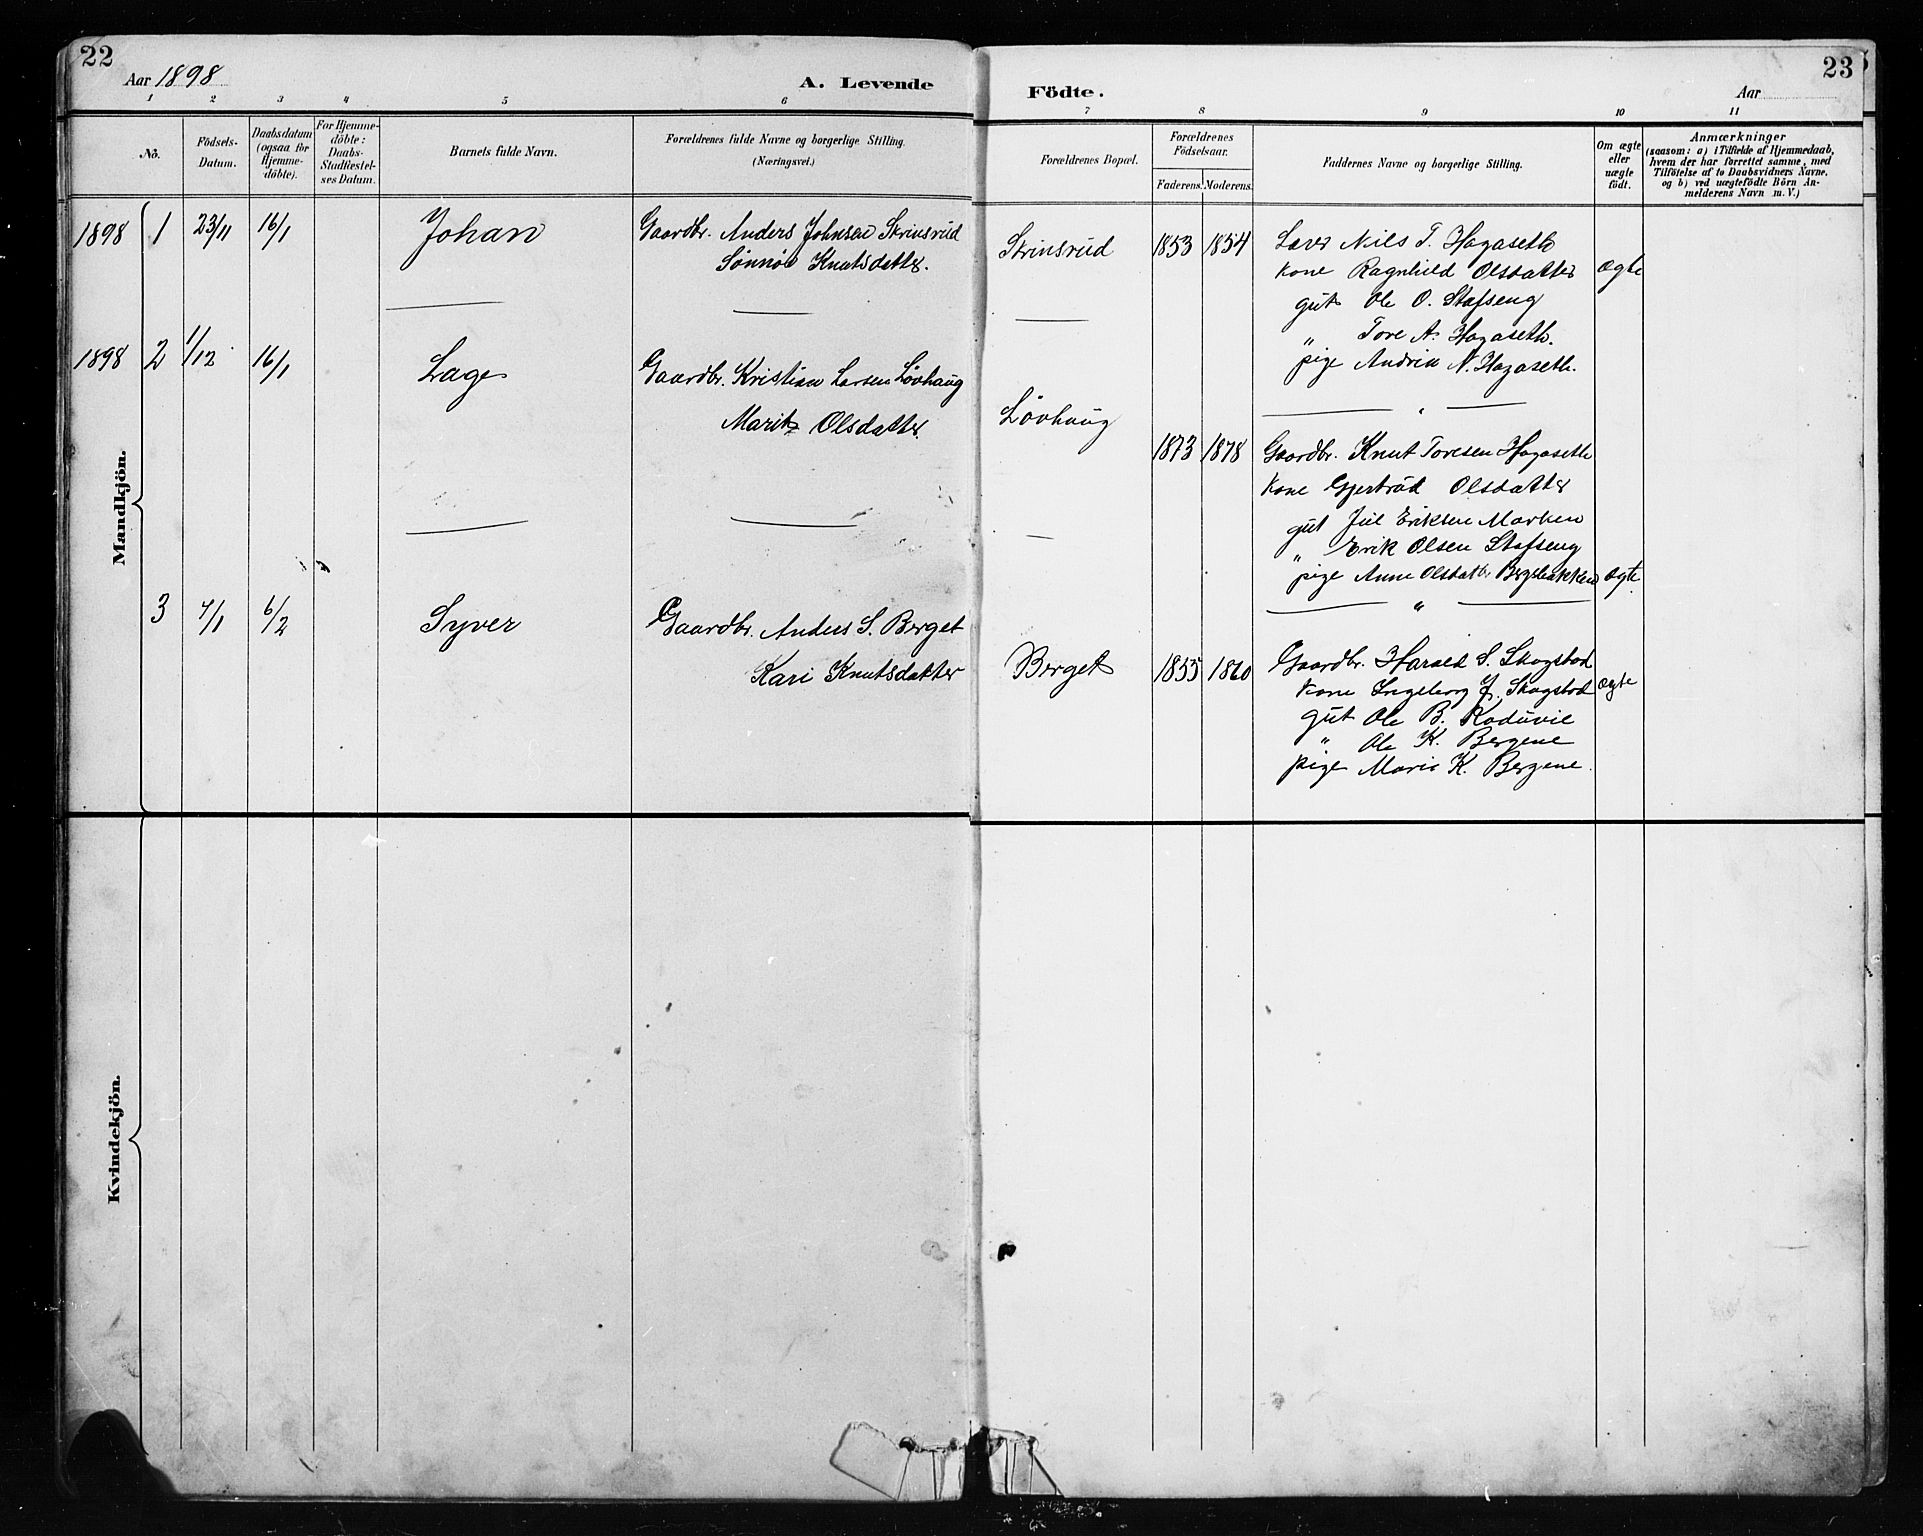 SAH, Etnedal prestekontor, H/Ha/Hab/Habb/L0001: Klokkerbok nr. II 1, 1894-1911, s. 22-23